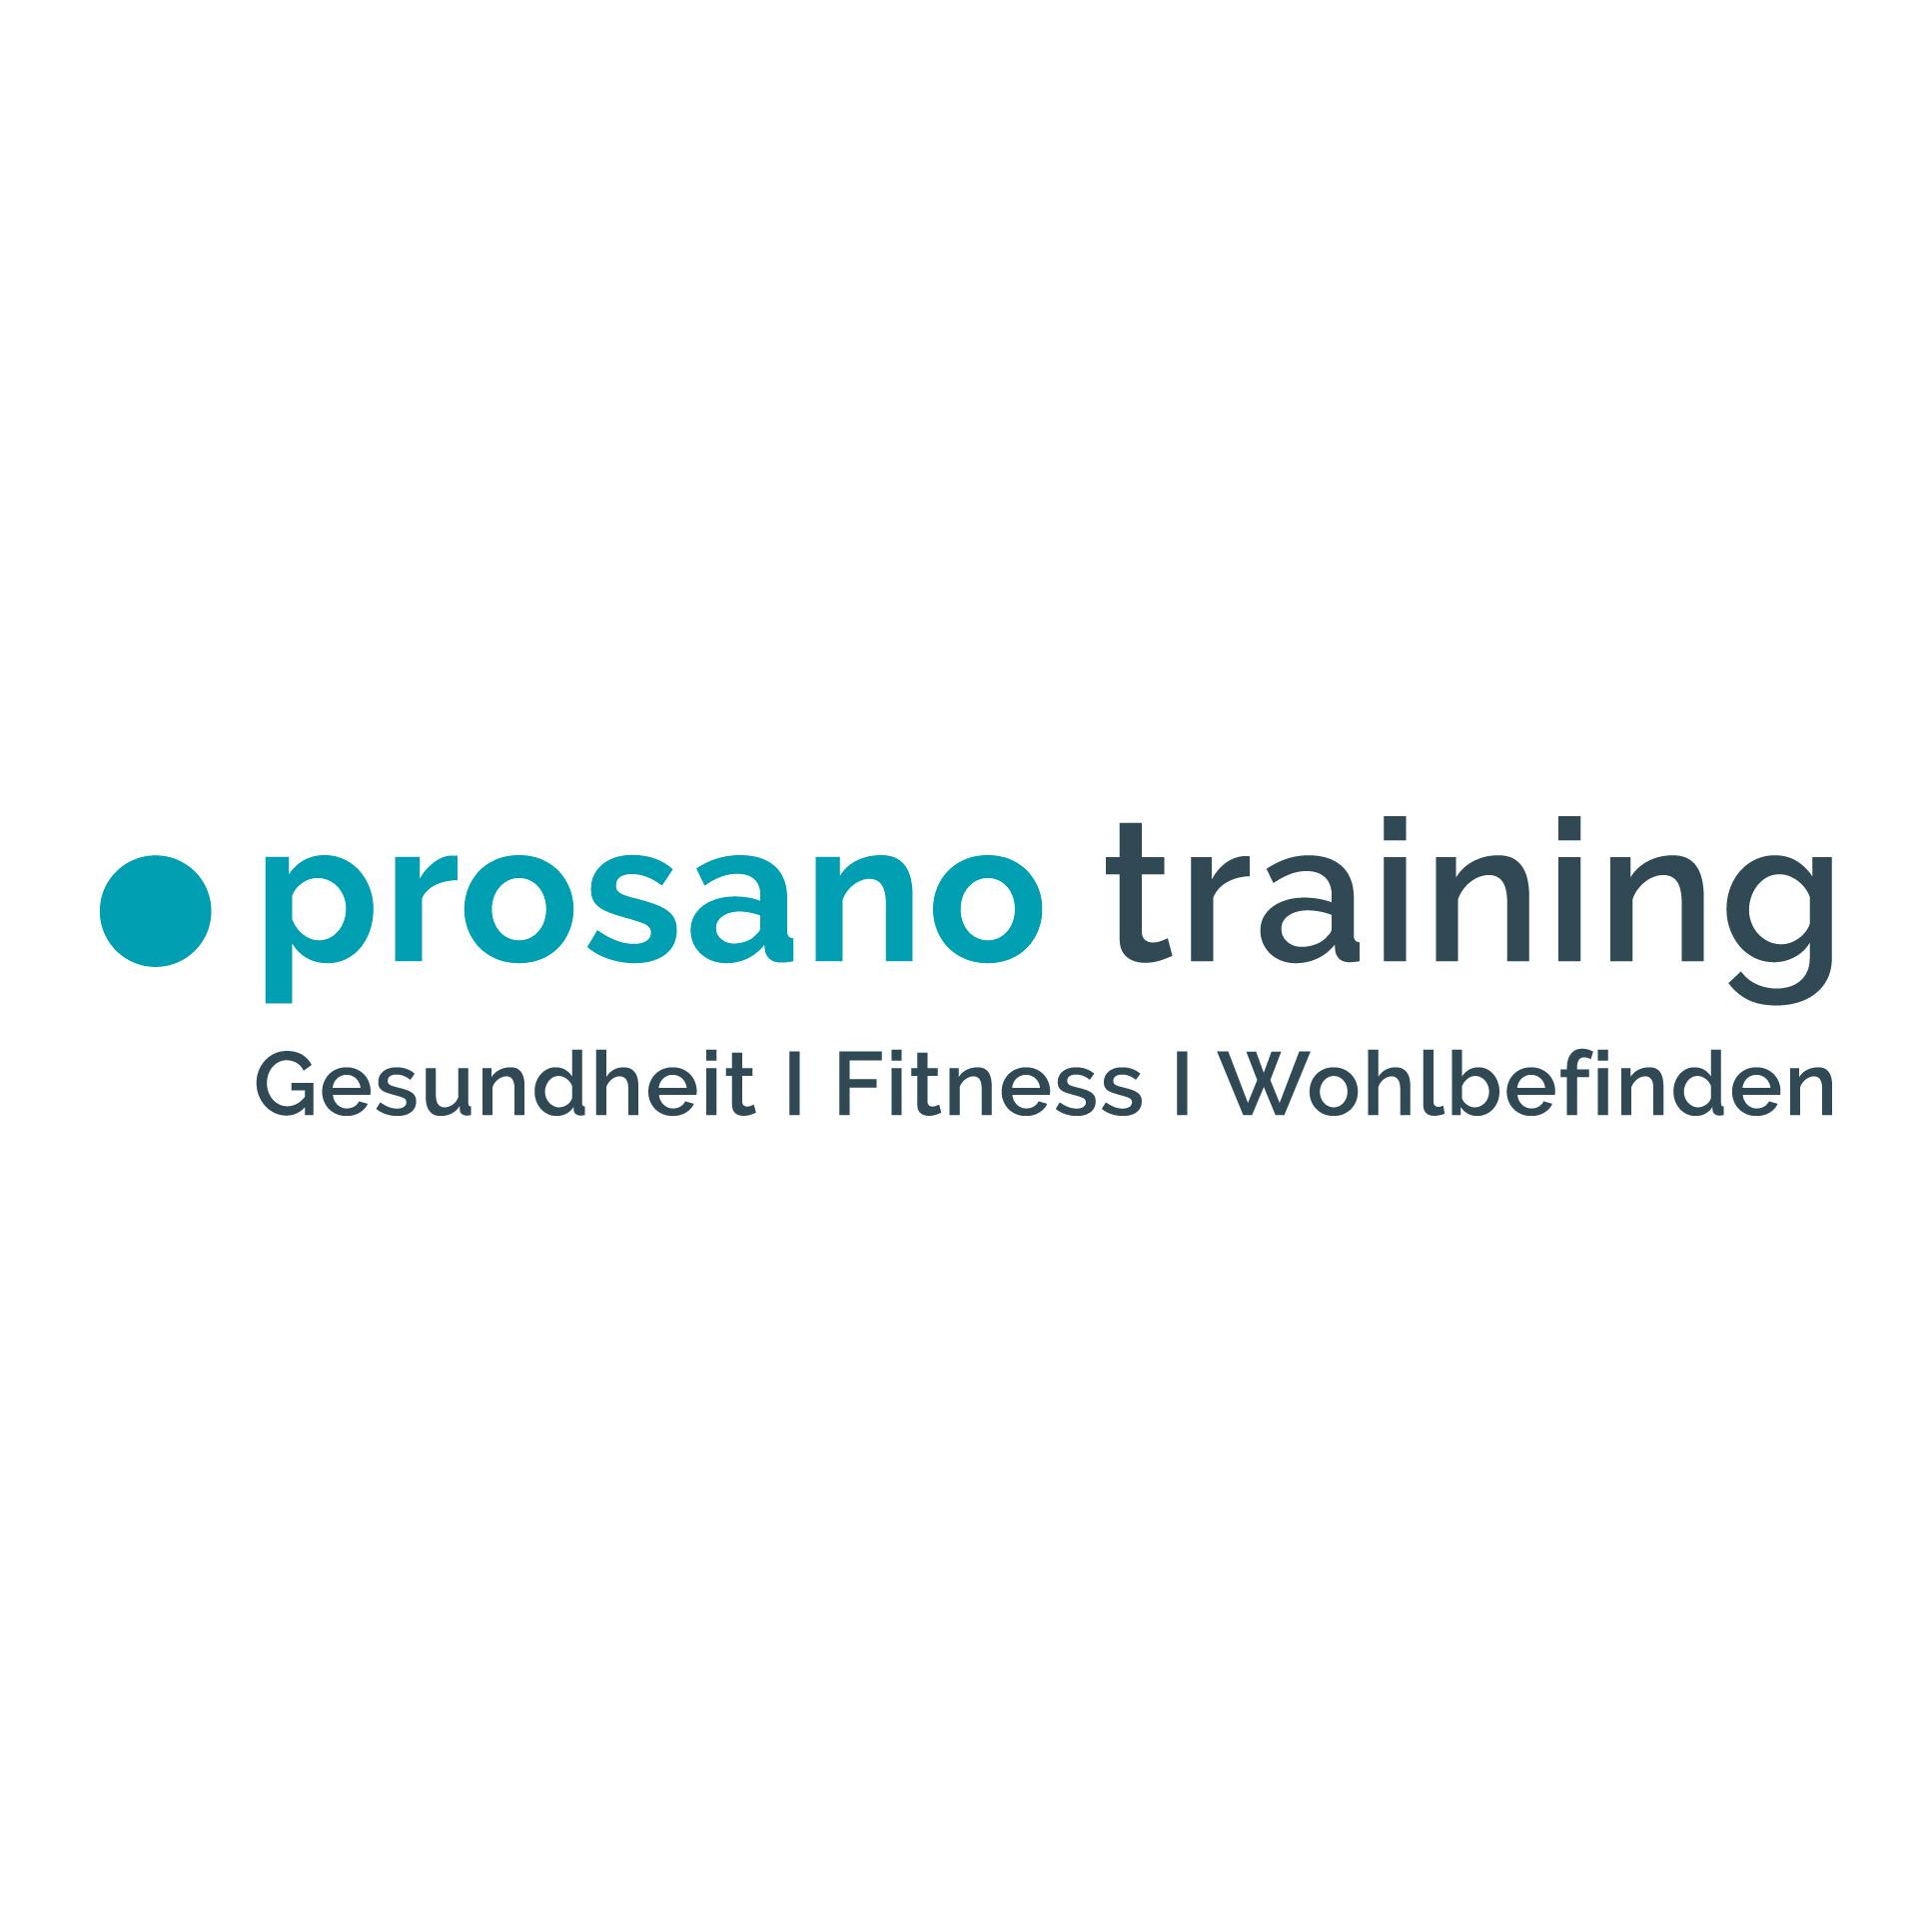 prosano training Mönchengladbach